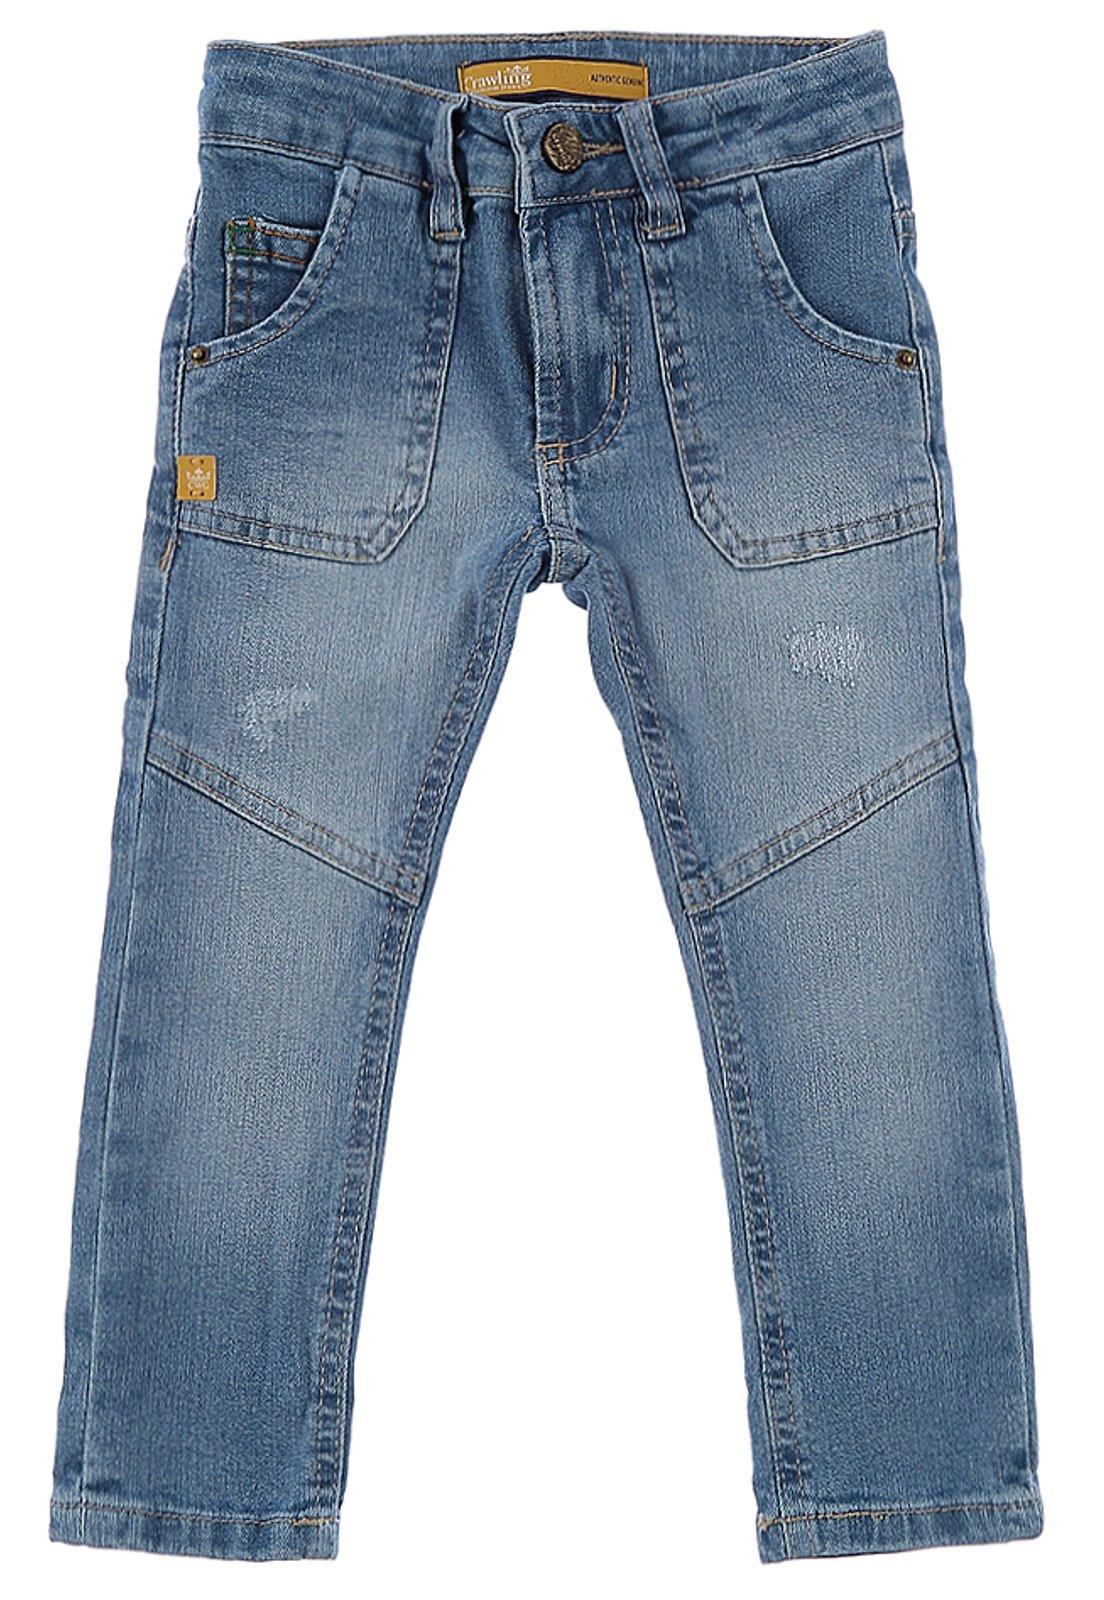 Calça Infantil Bebê Skinny Crawling Jeans